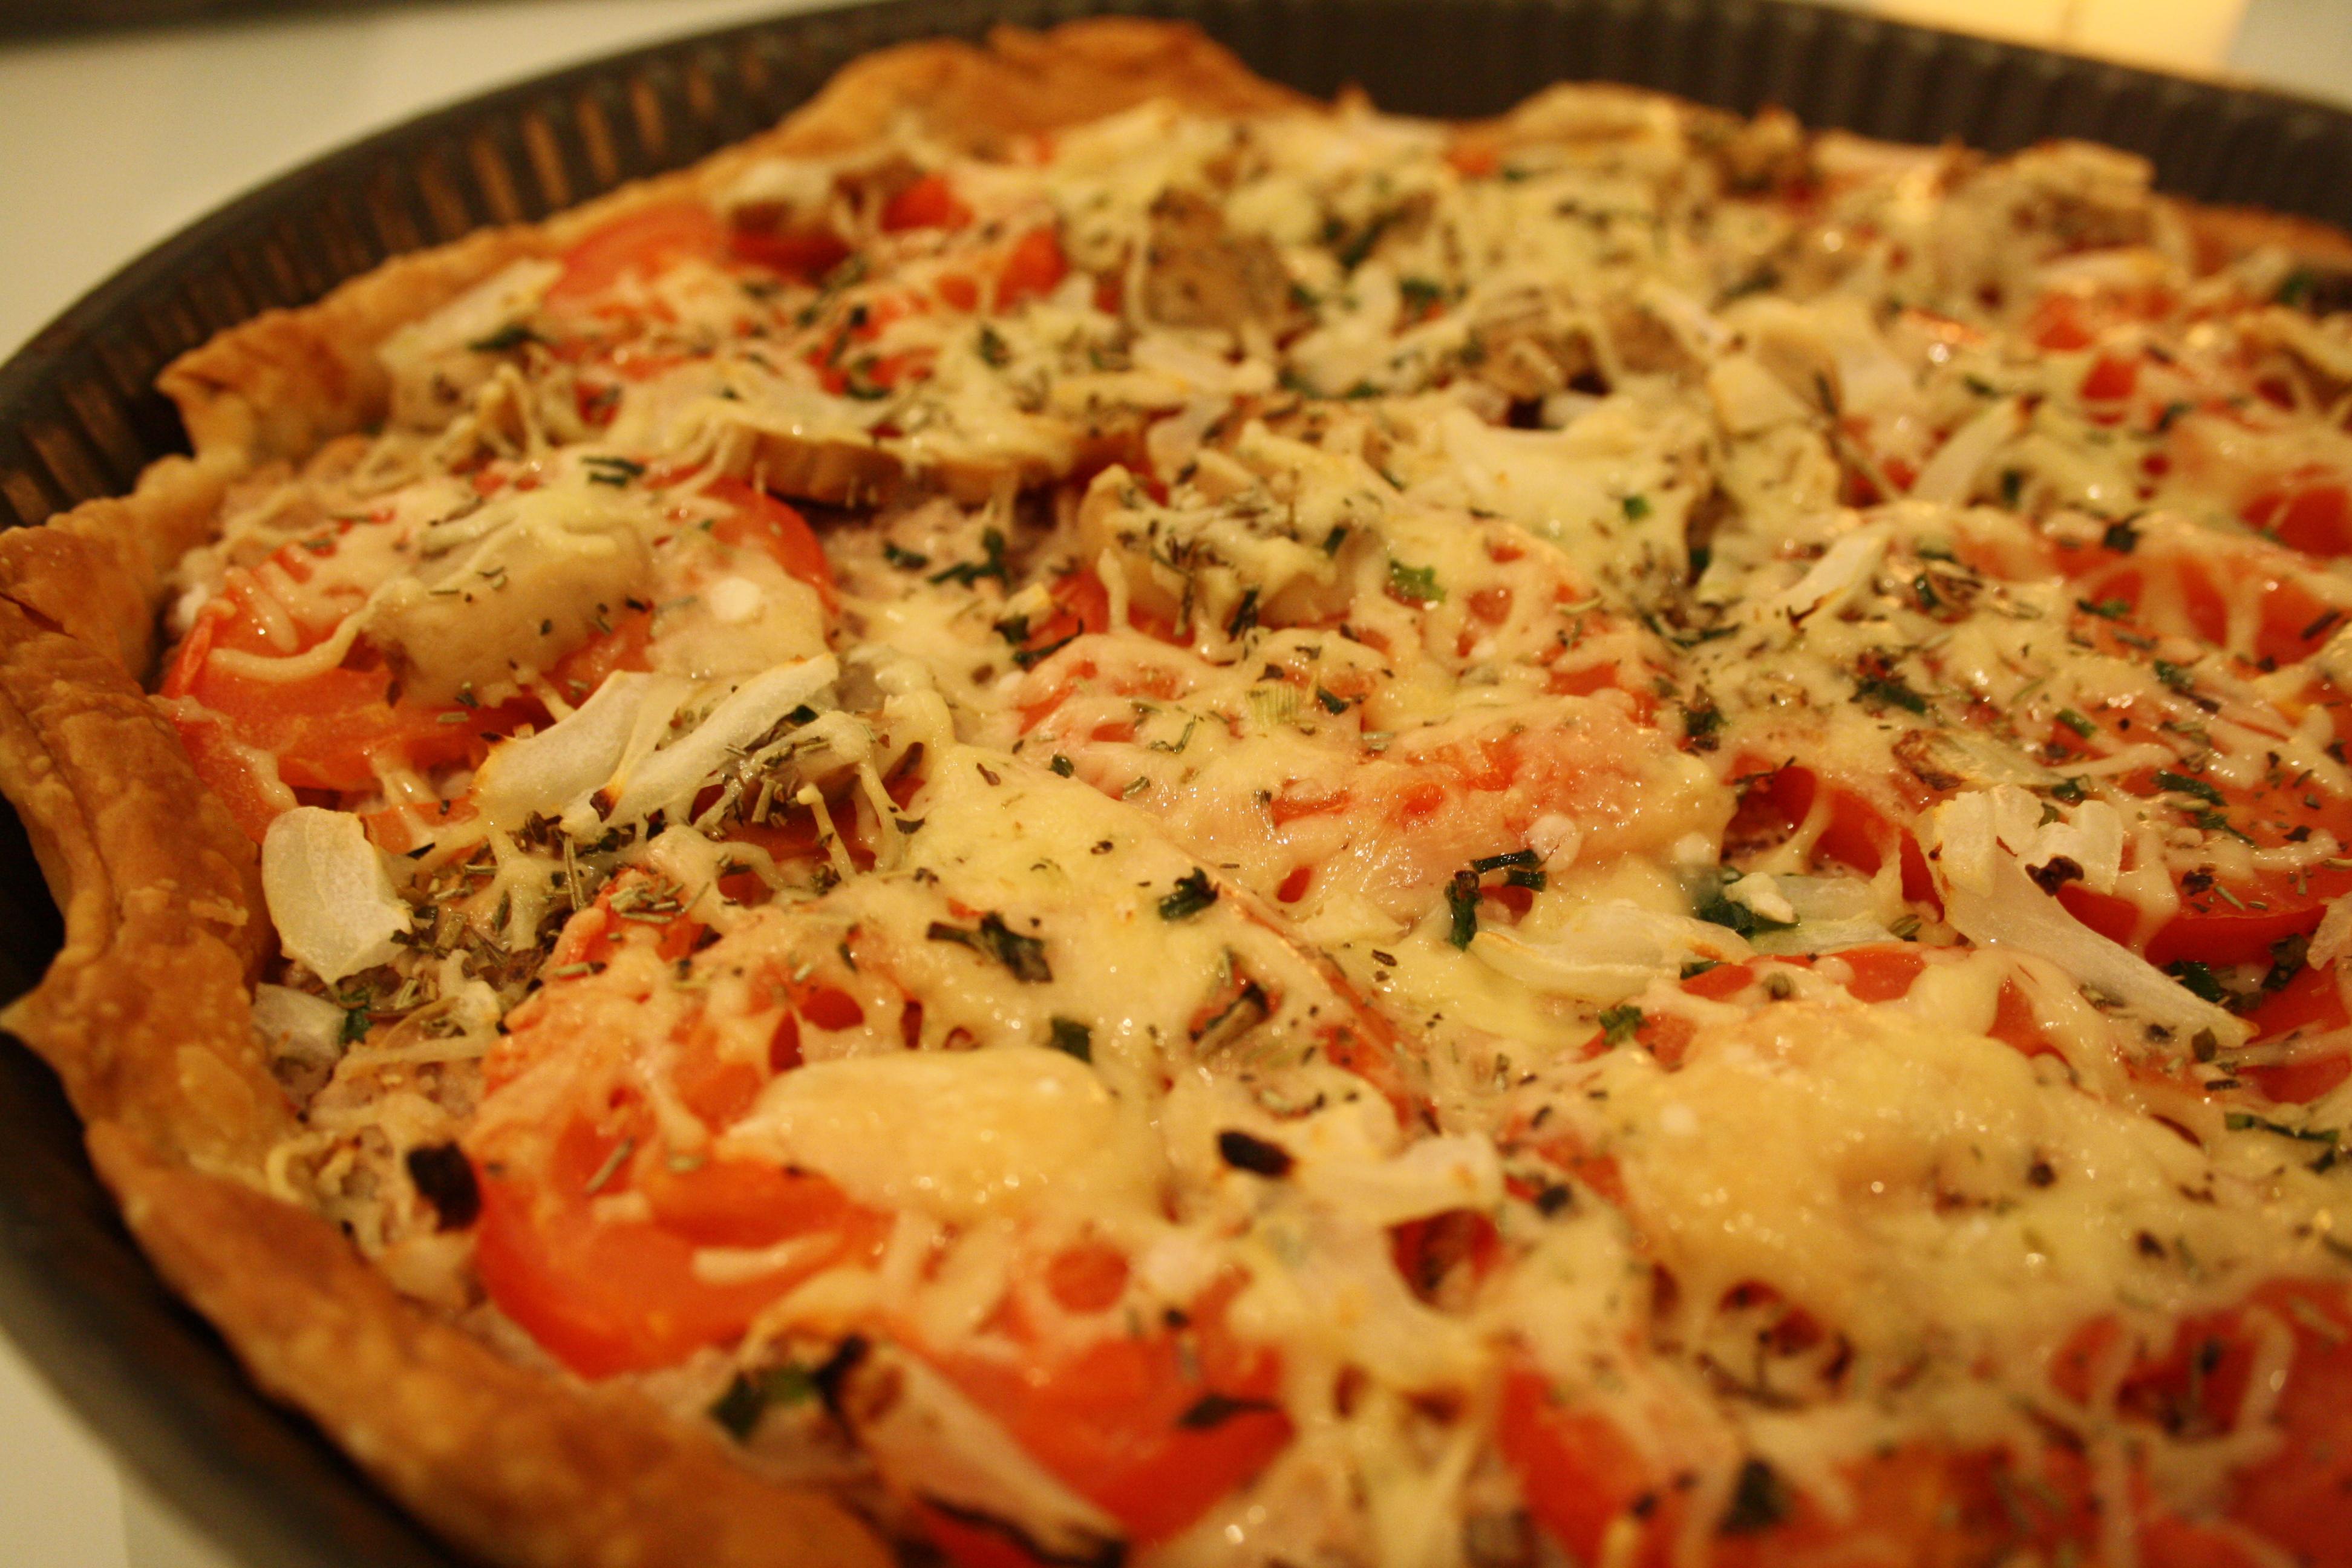 Mathilde et Gourmandises - Tarte Tomate Mozzarella Champignons